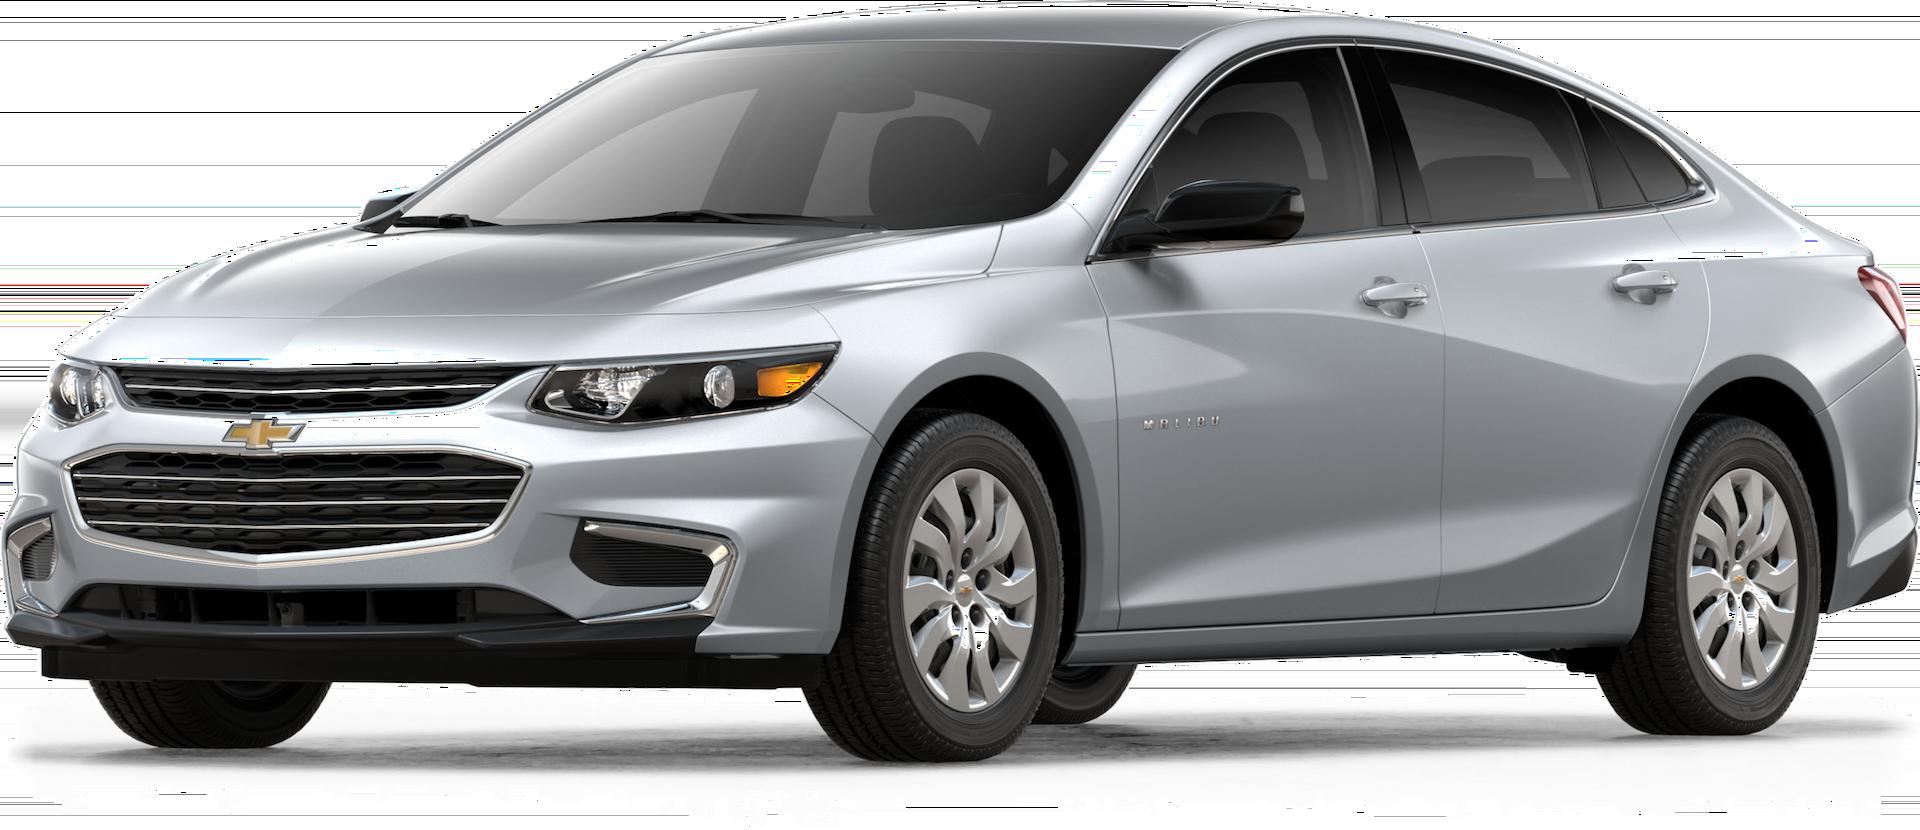 2018 Chevrolet Malibu Models | LS vs LT vs Premier